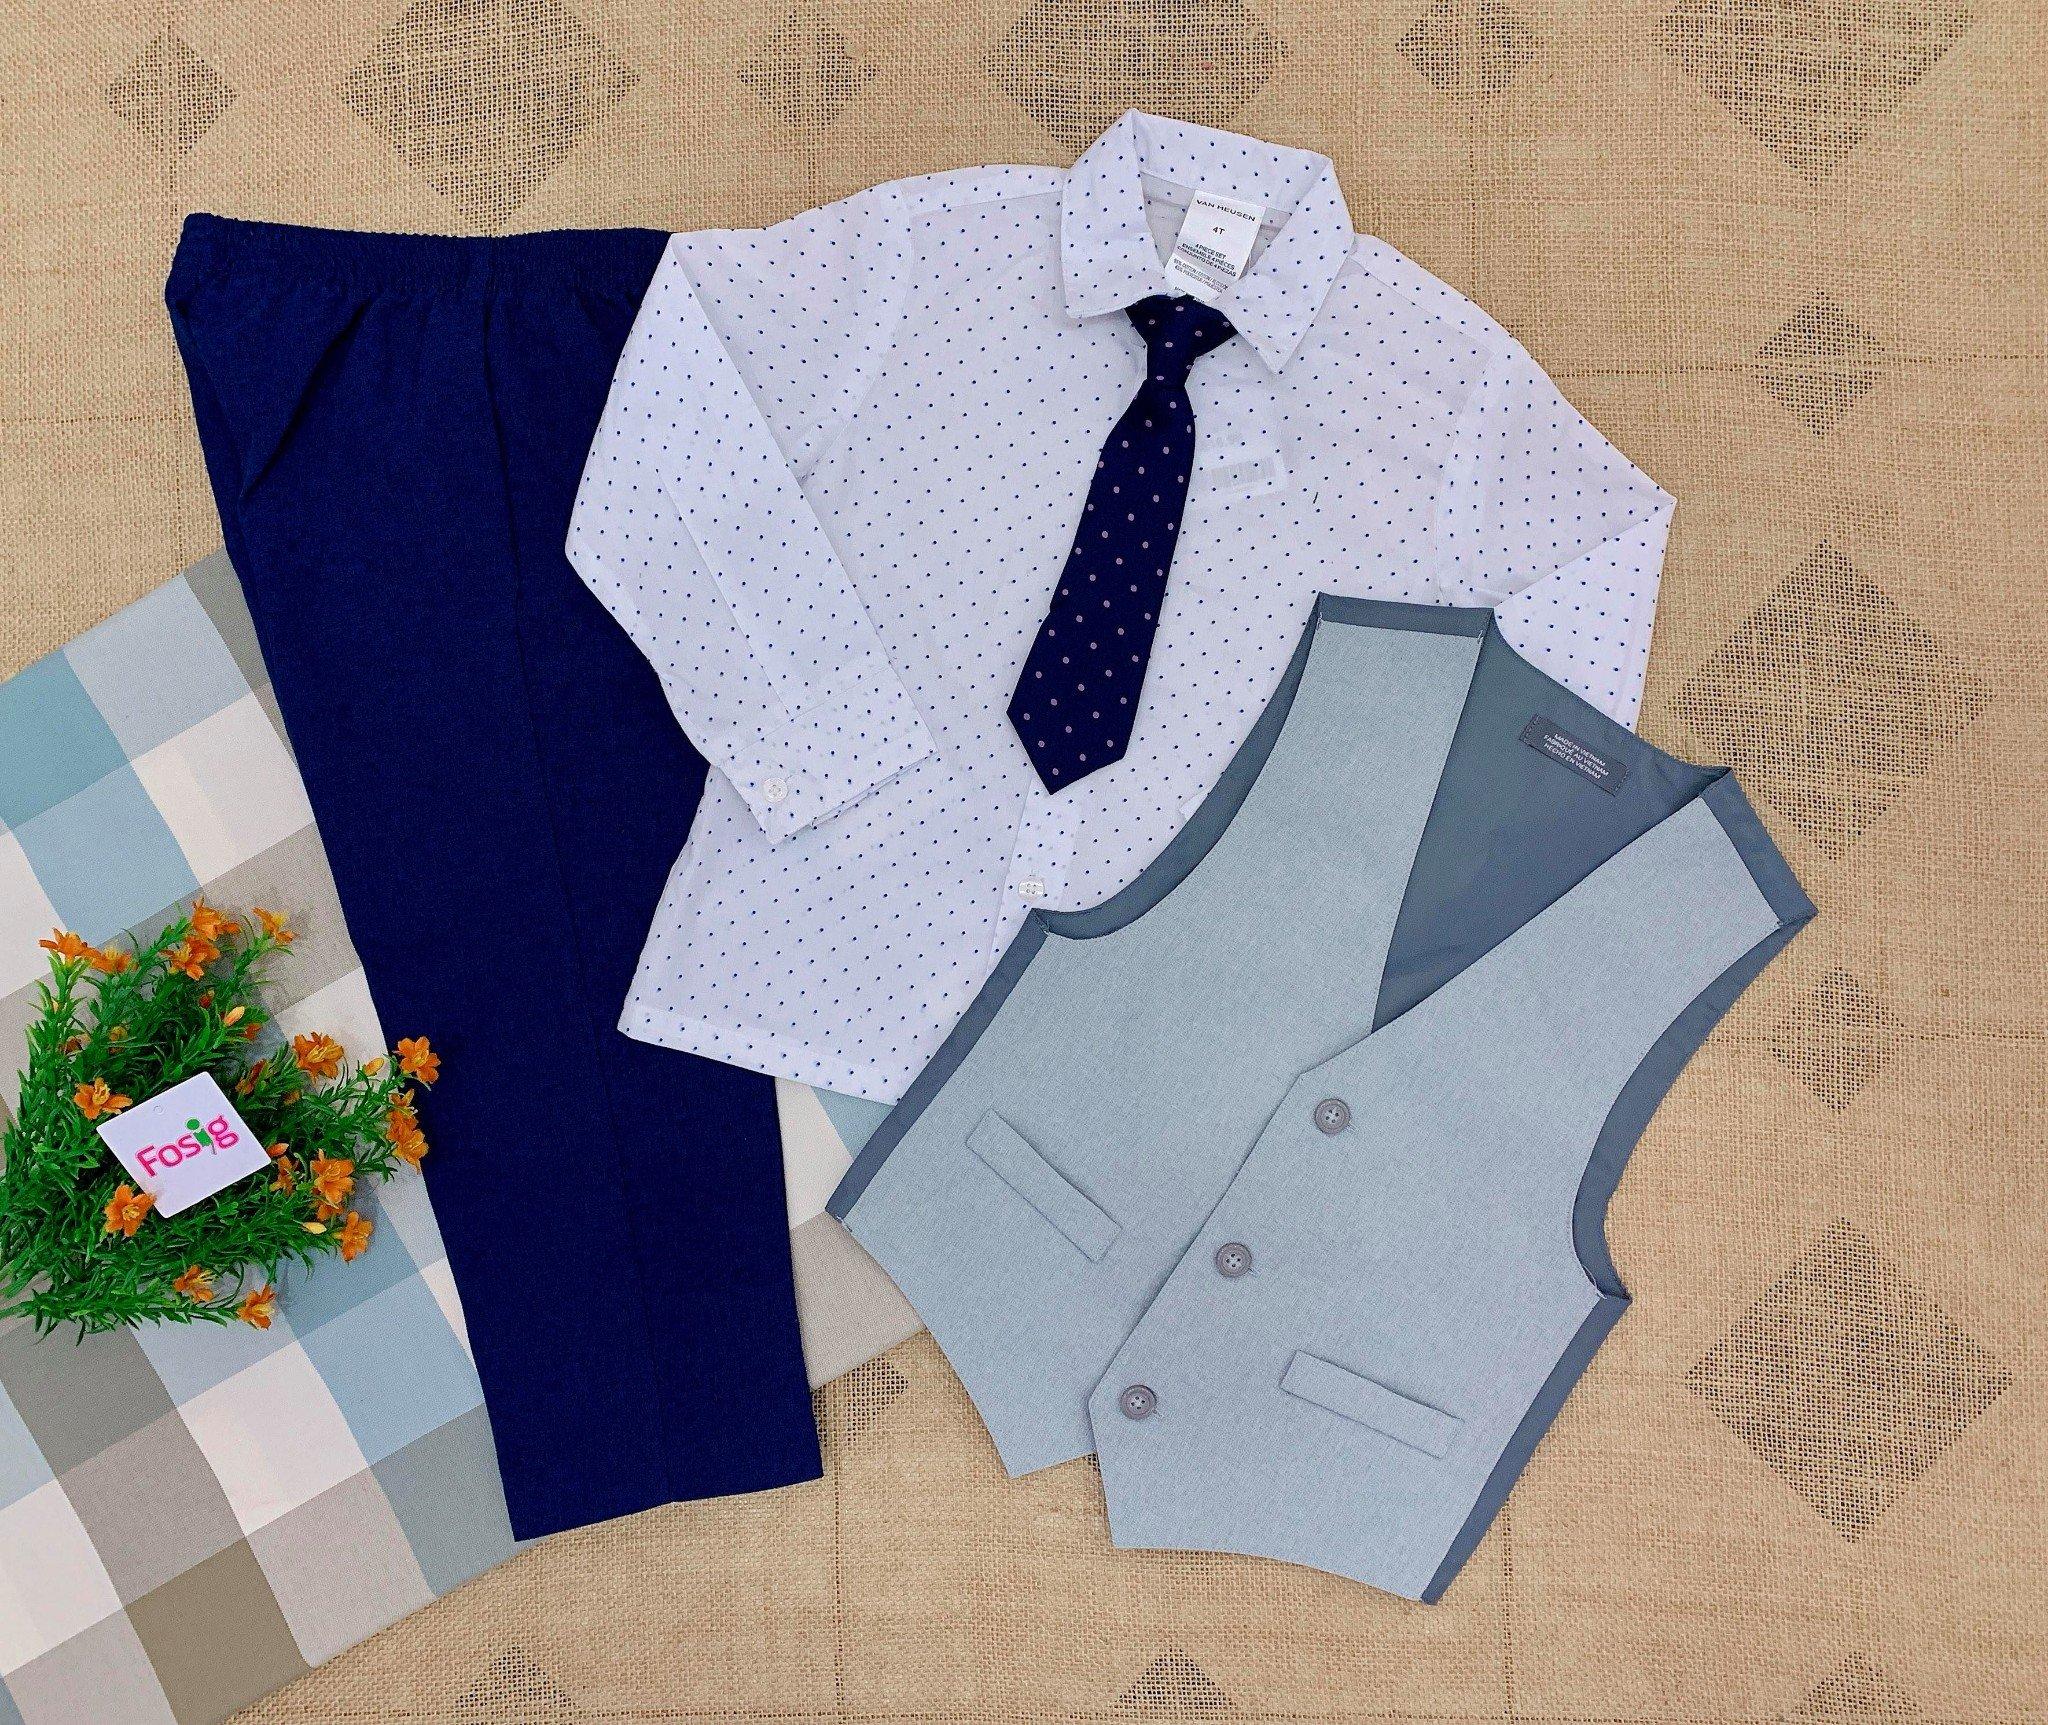 15-16kgBộ Vest Van HeuSen [Boy] - Xám/Chấm Bi